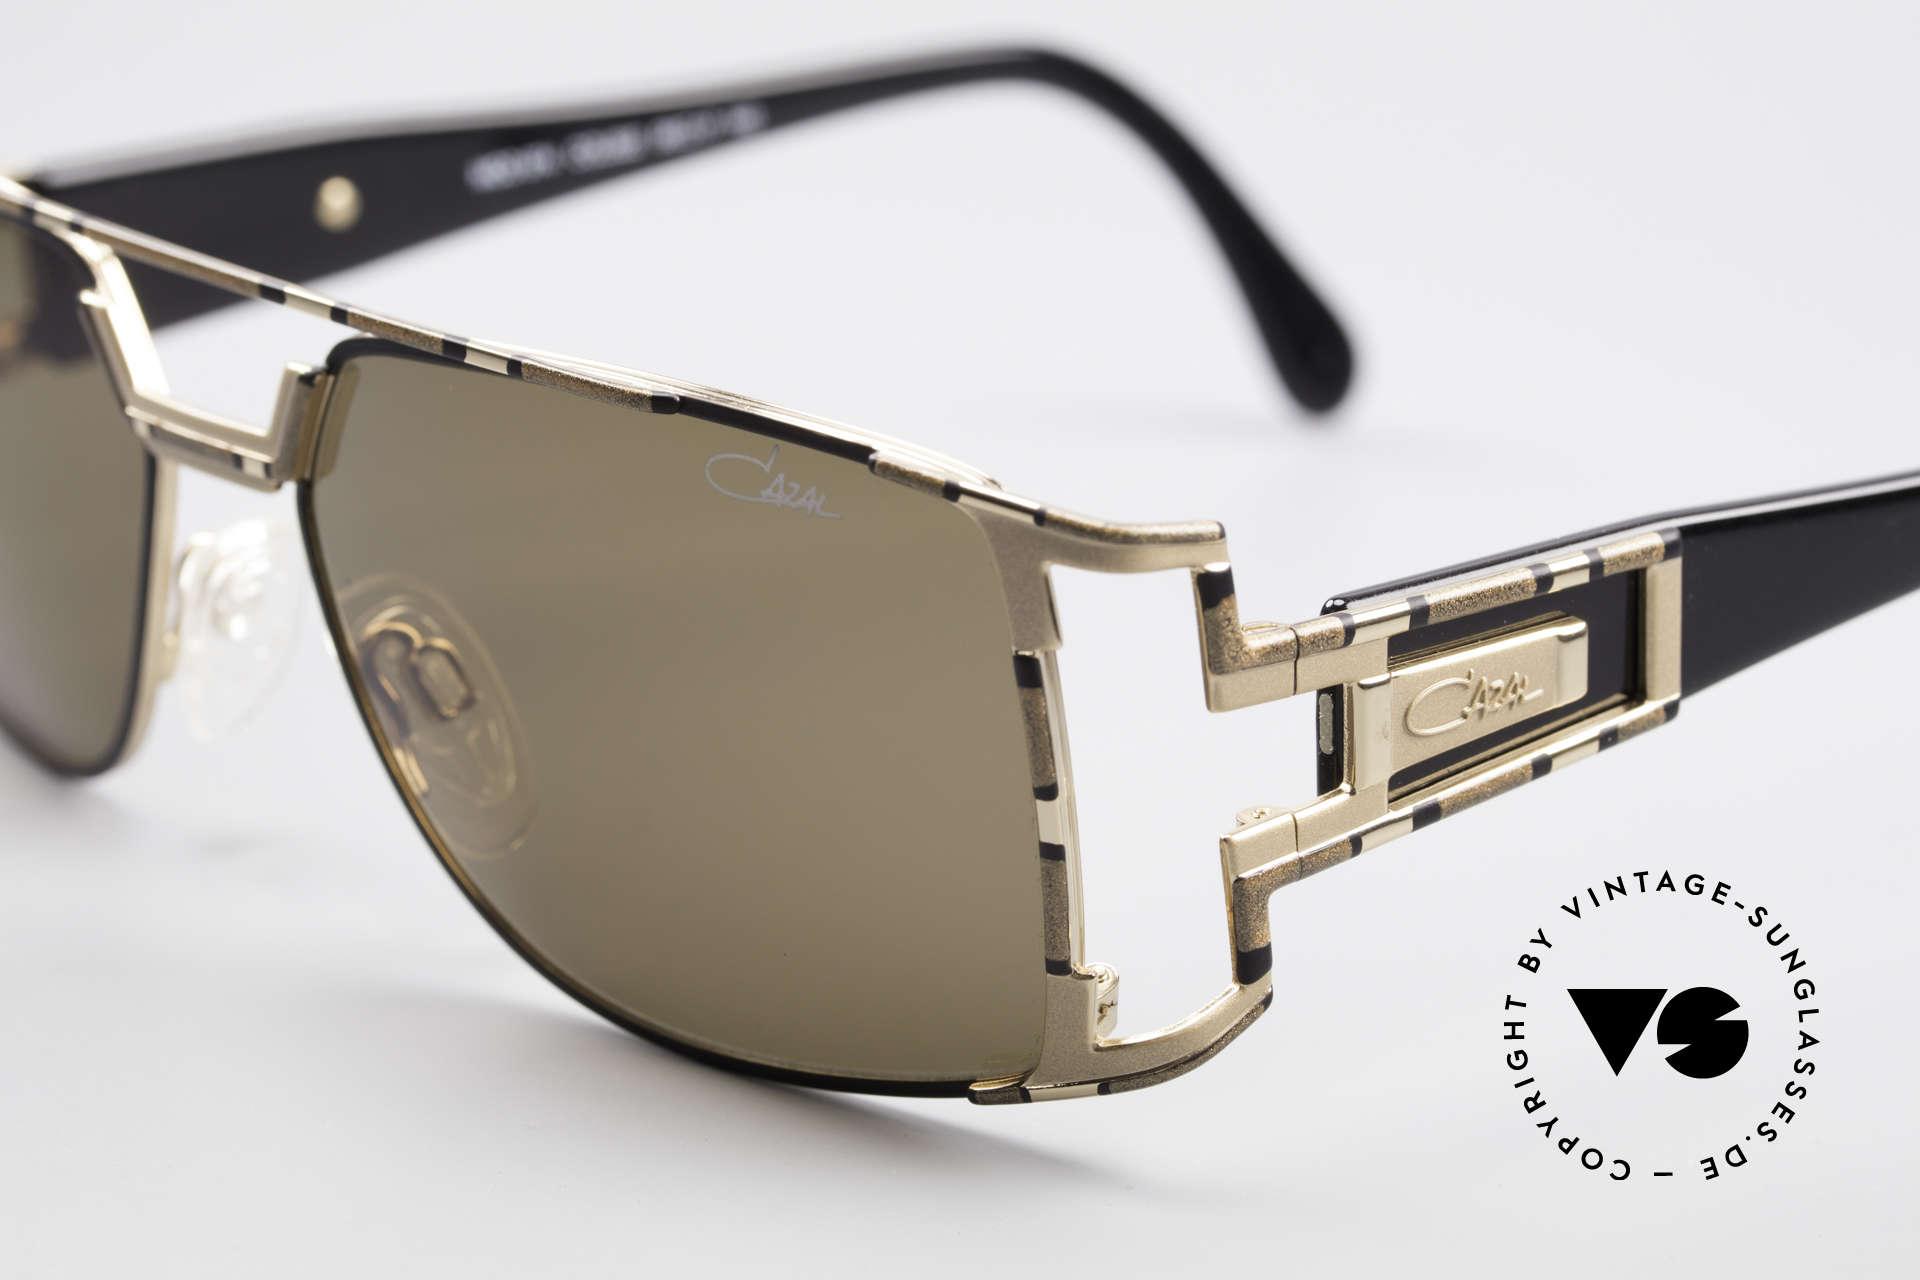 Cazal 974 Unisex Design Men Women, tangible (made in Germany) premium quality; 100% UV, Made for Men and Women